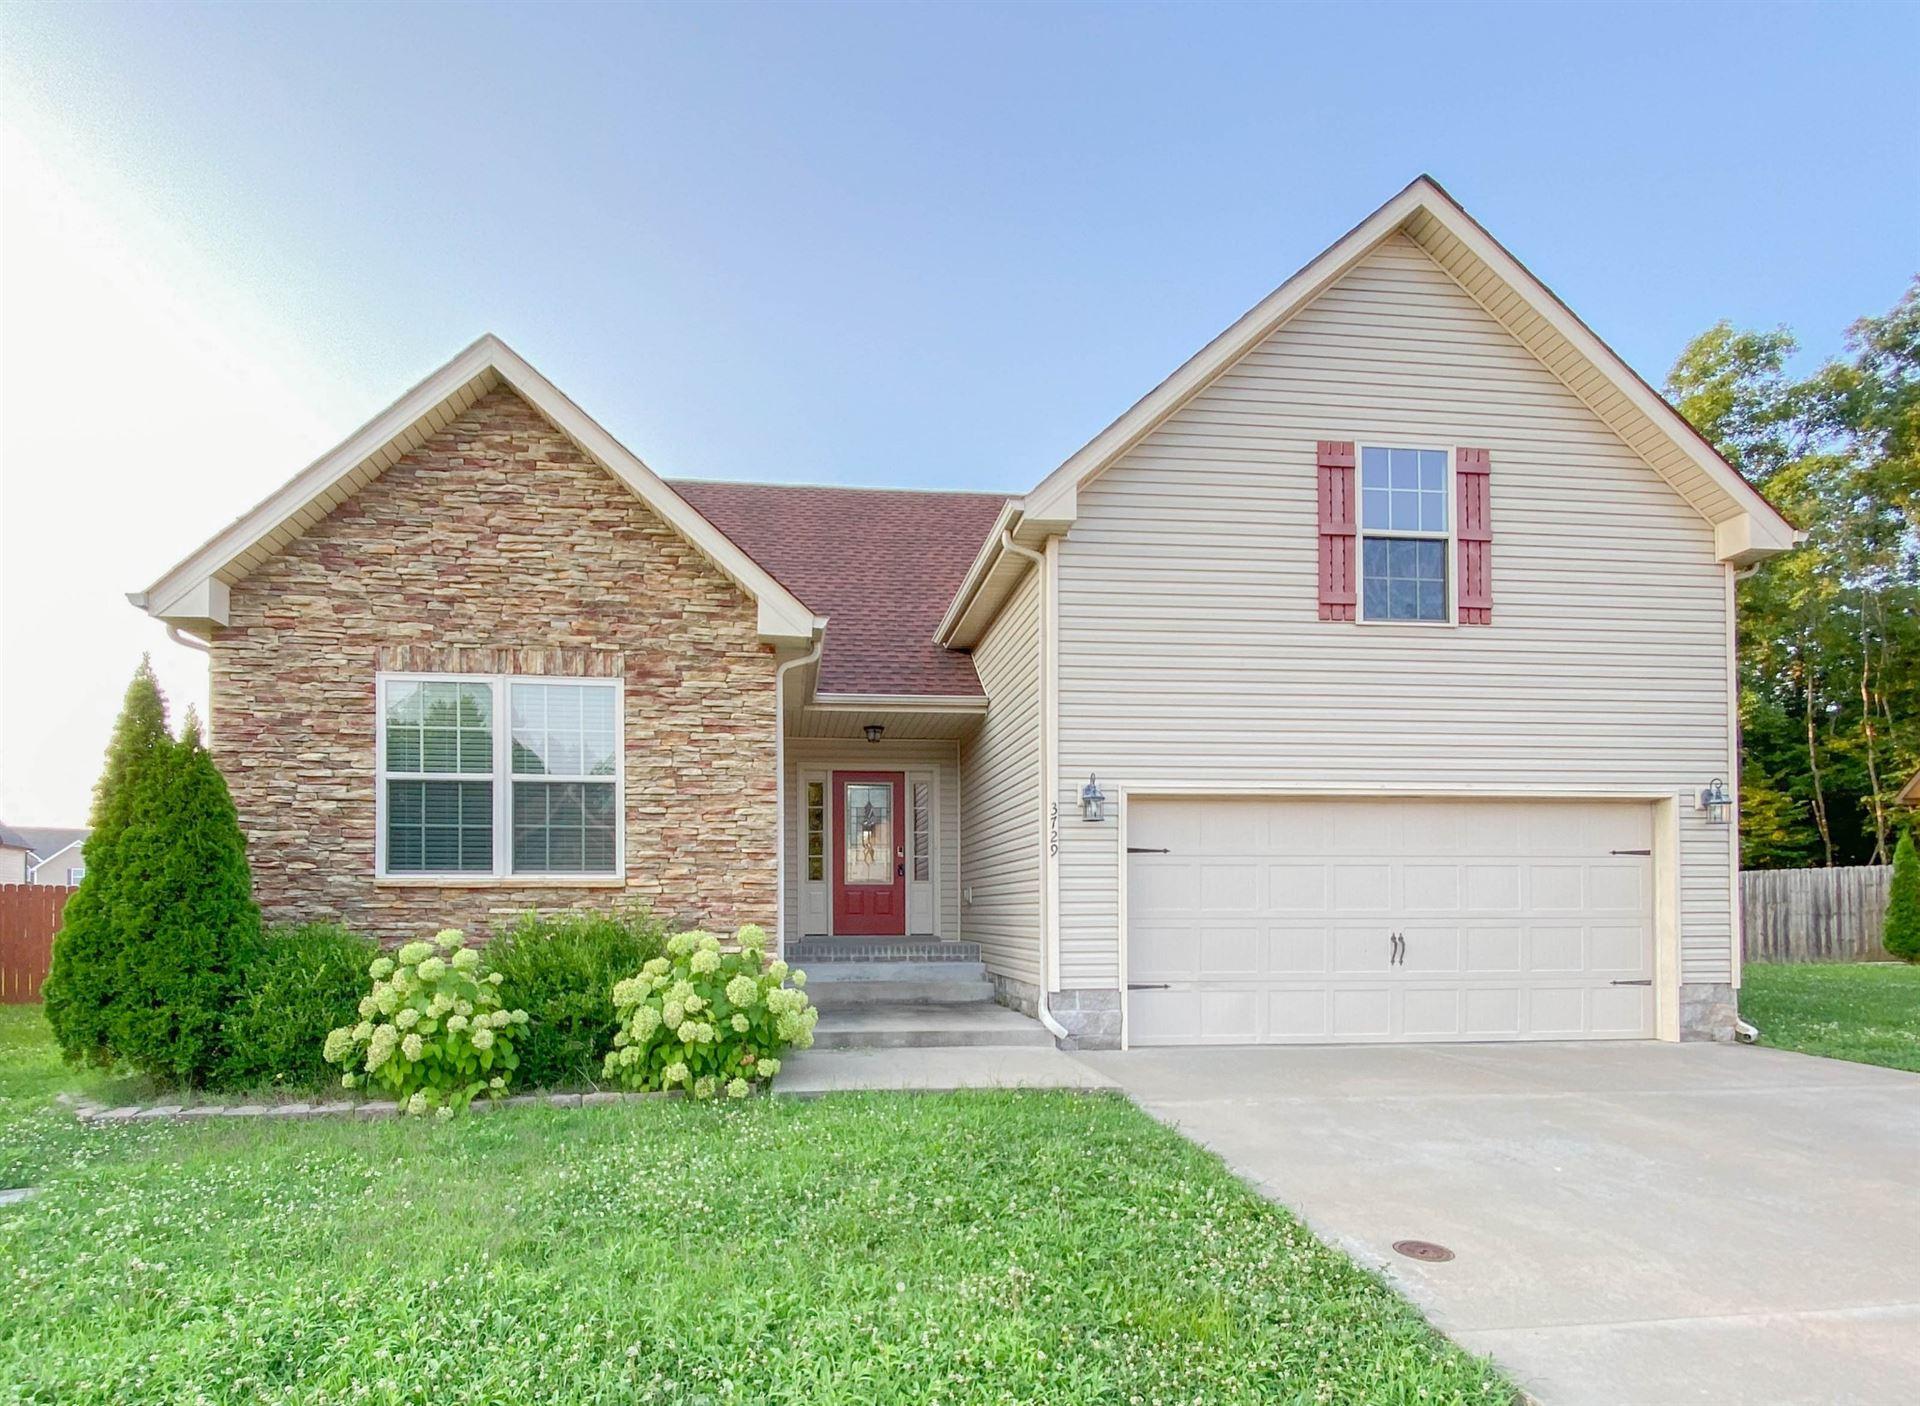 3729 Crisscross Ct, Clarksville, TN 37040 - MLS#: 2275546